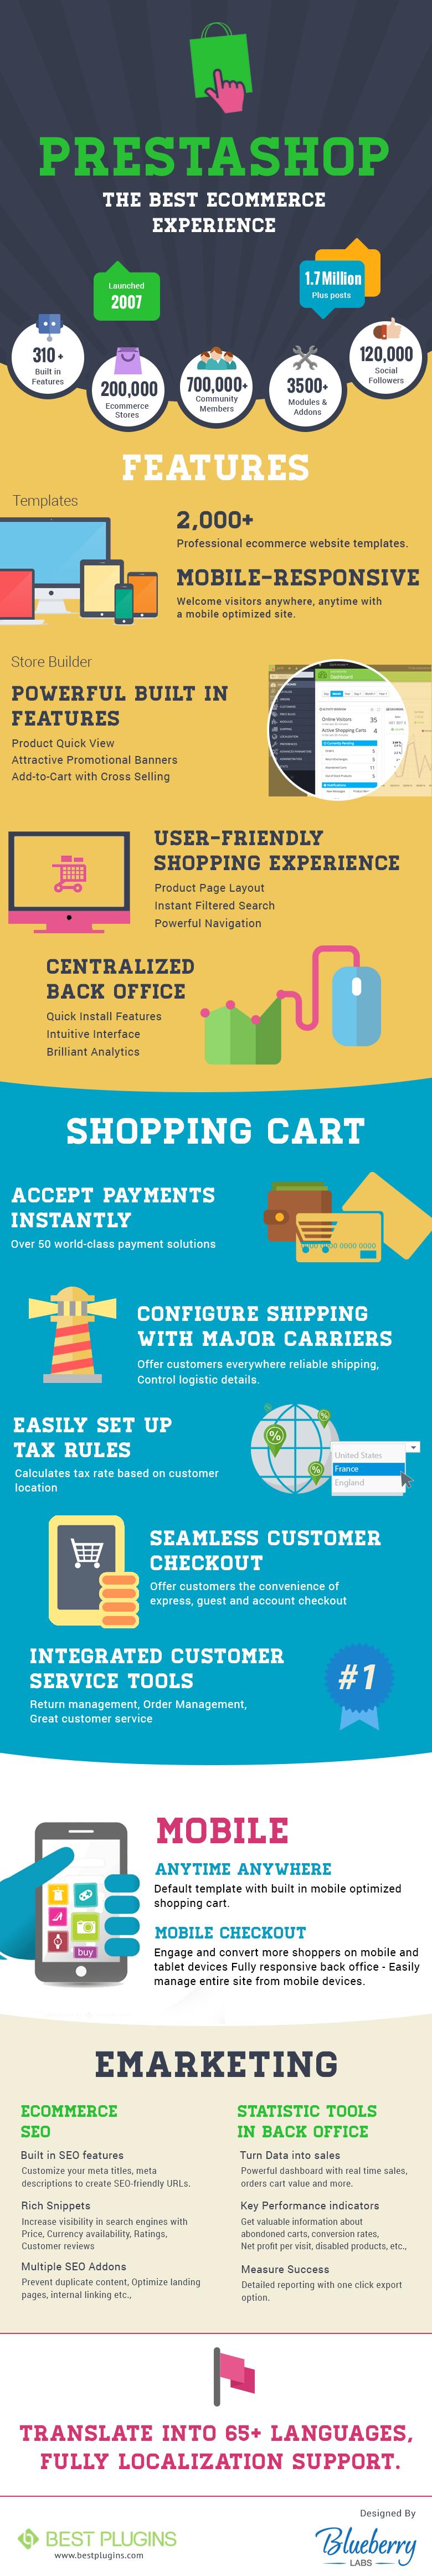 infographie-prestashop-ecommerce